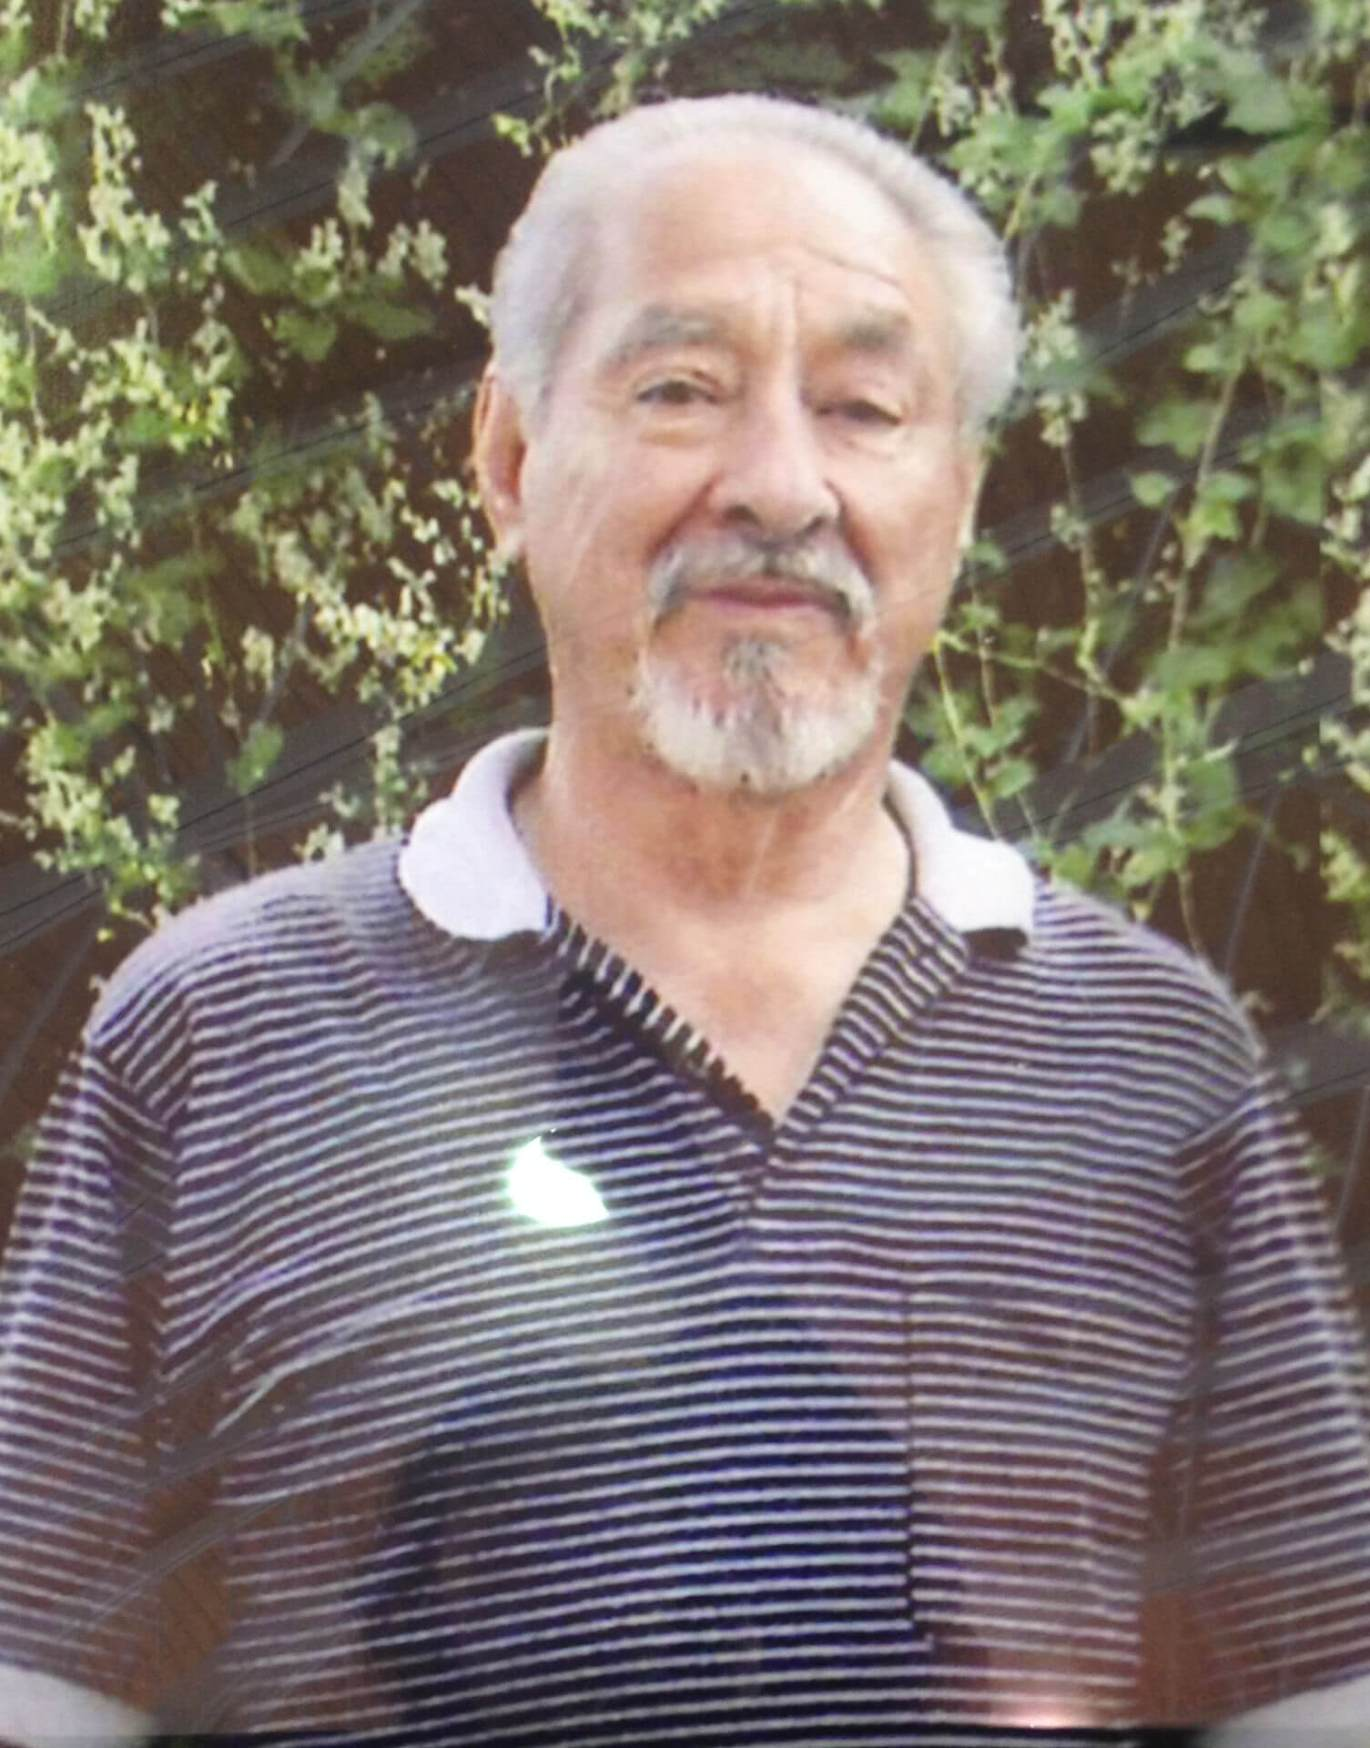 Joe M. Lucero